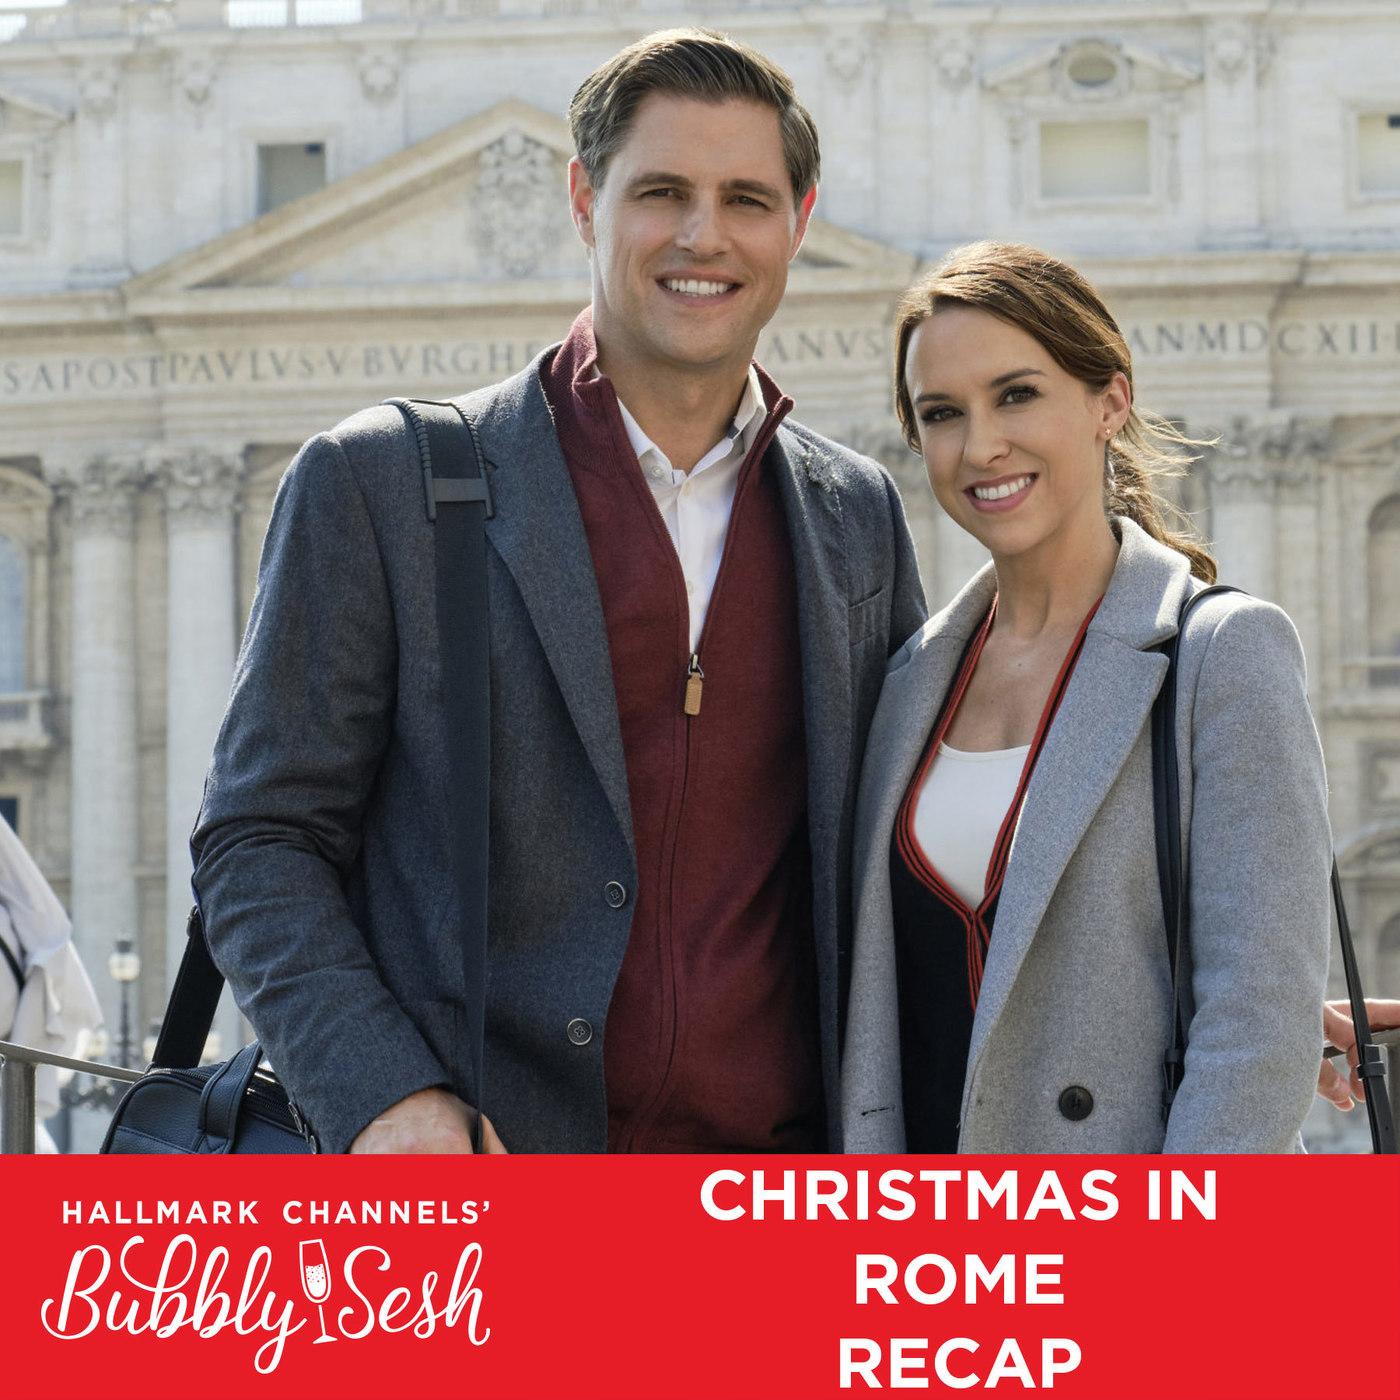 Christmas in Rome Recap